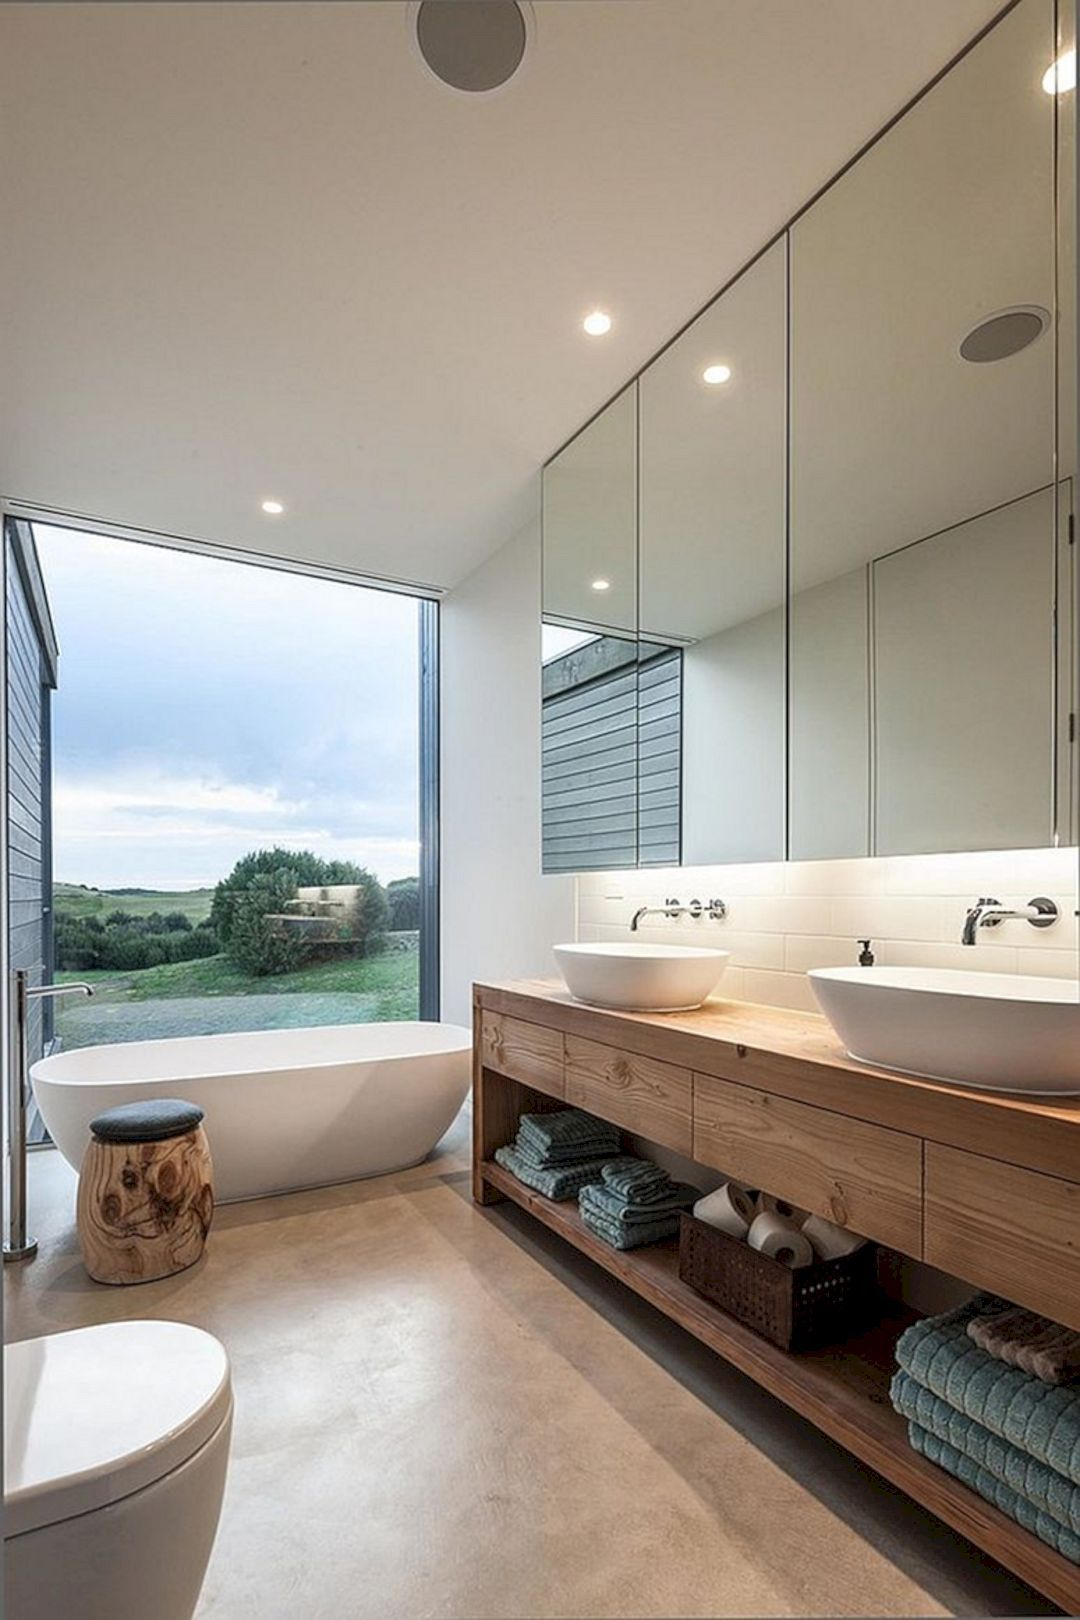 Stylish Modern Bathroom: 128 Best Designs Roundup | banyolar ... on php designer, word designer, audio designer, form designer, html5 designer, marketing designer, database designer, operating system designer,